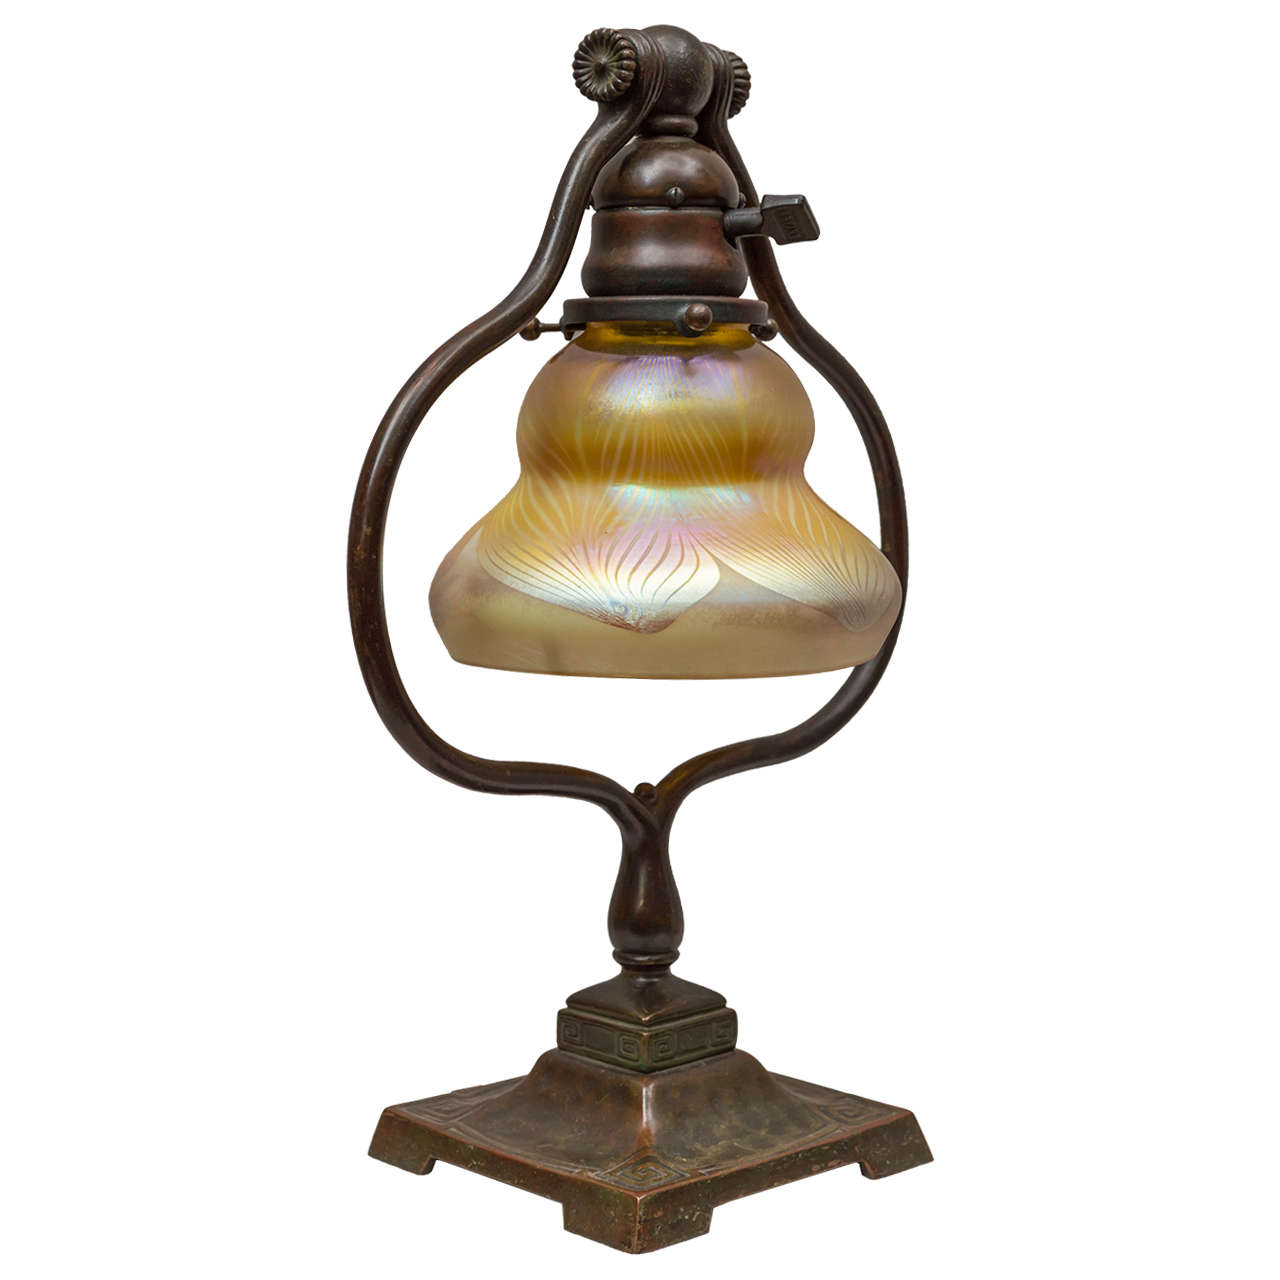 Tiffany Studios Lamp For Sale At 1stdibs